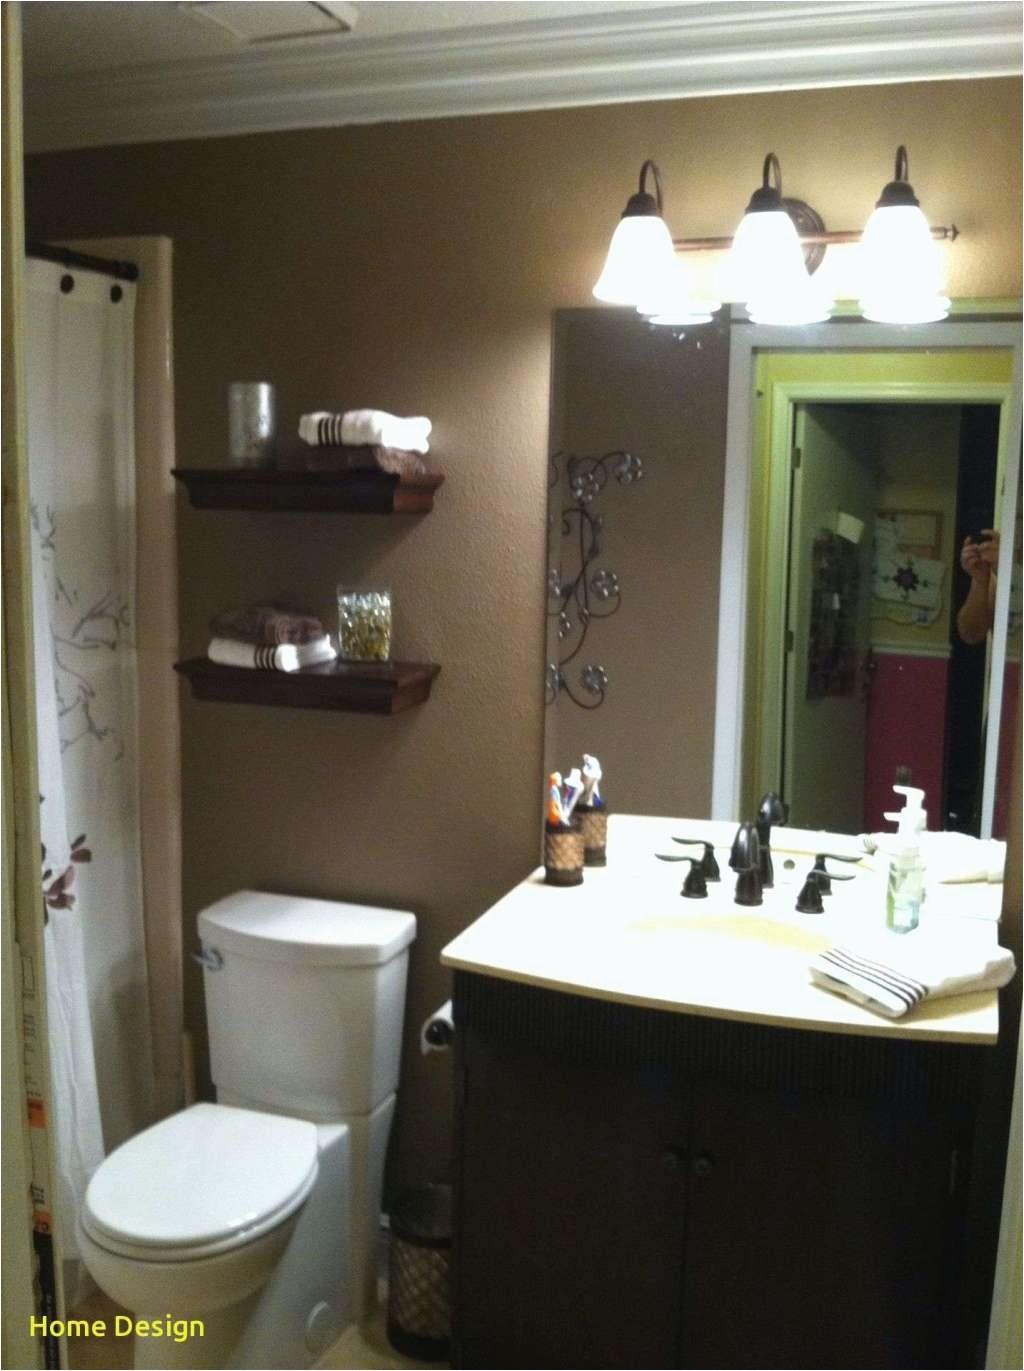 Bathroom Design Checklist Unique 49 Inspirational Master Bathroom Remodel Ideas Stock